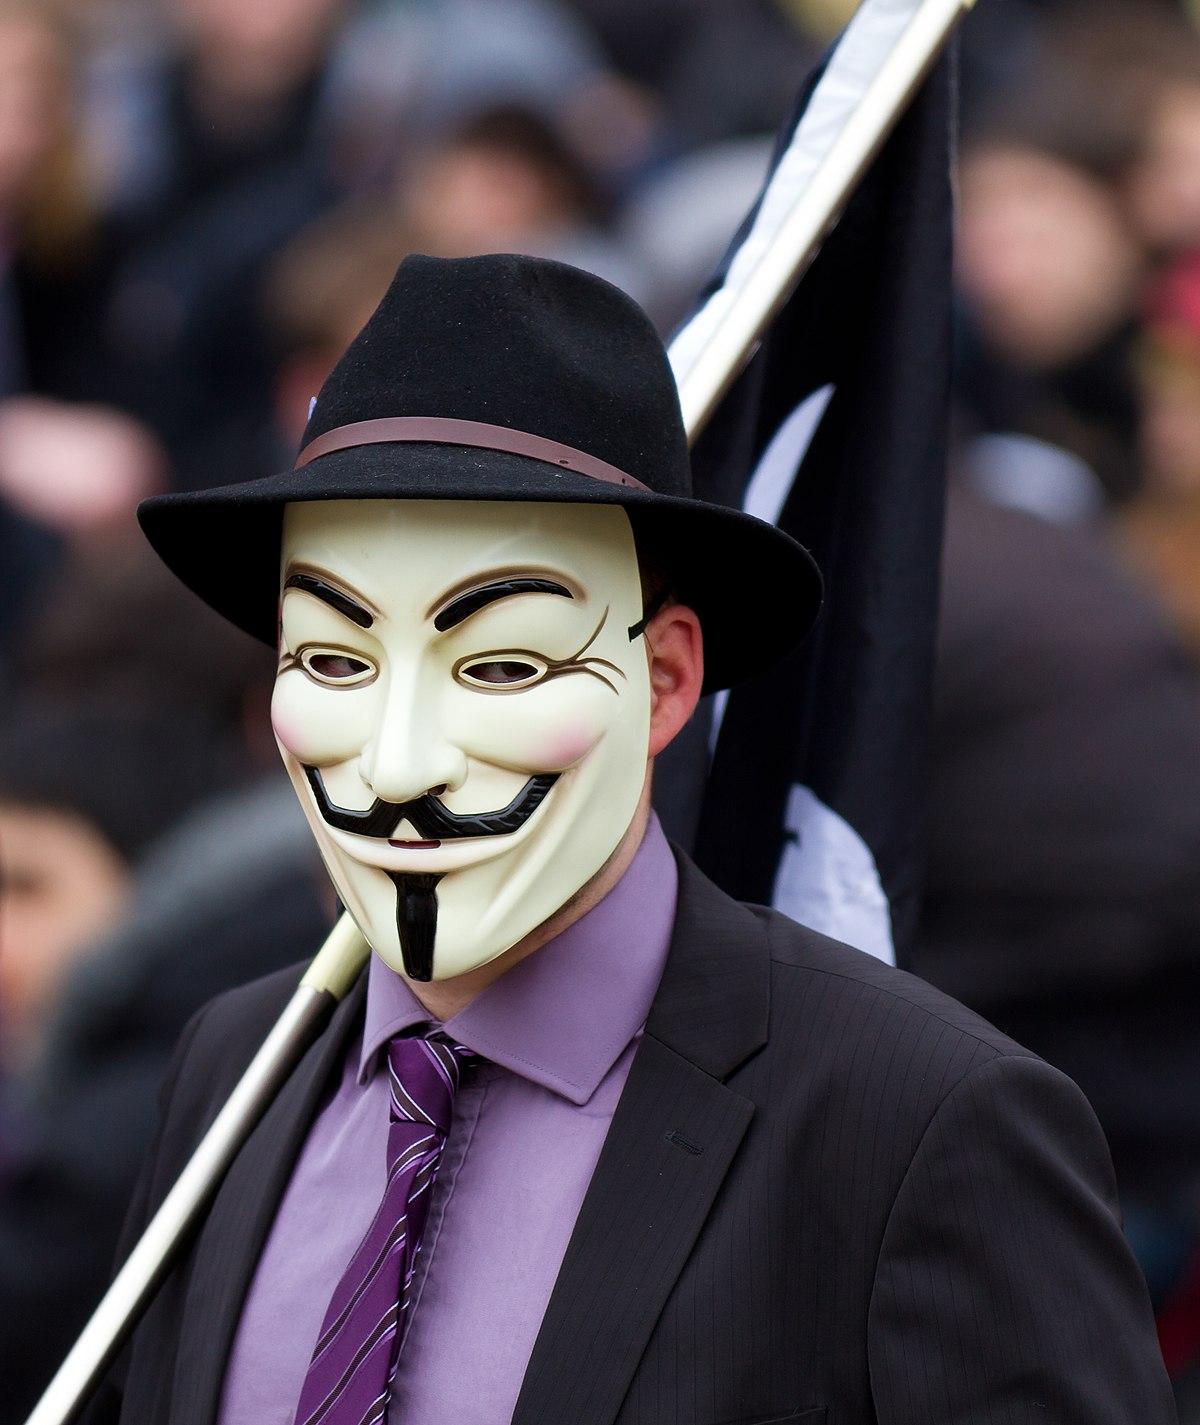 maschera di guy fawkes wikipedia